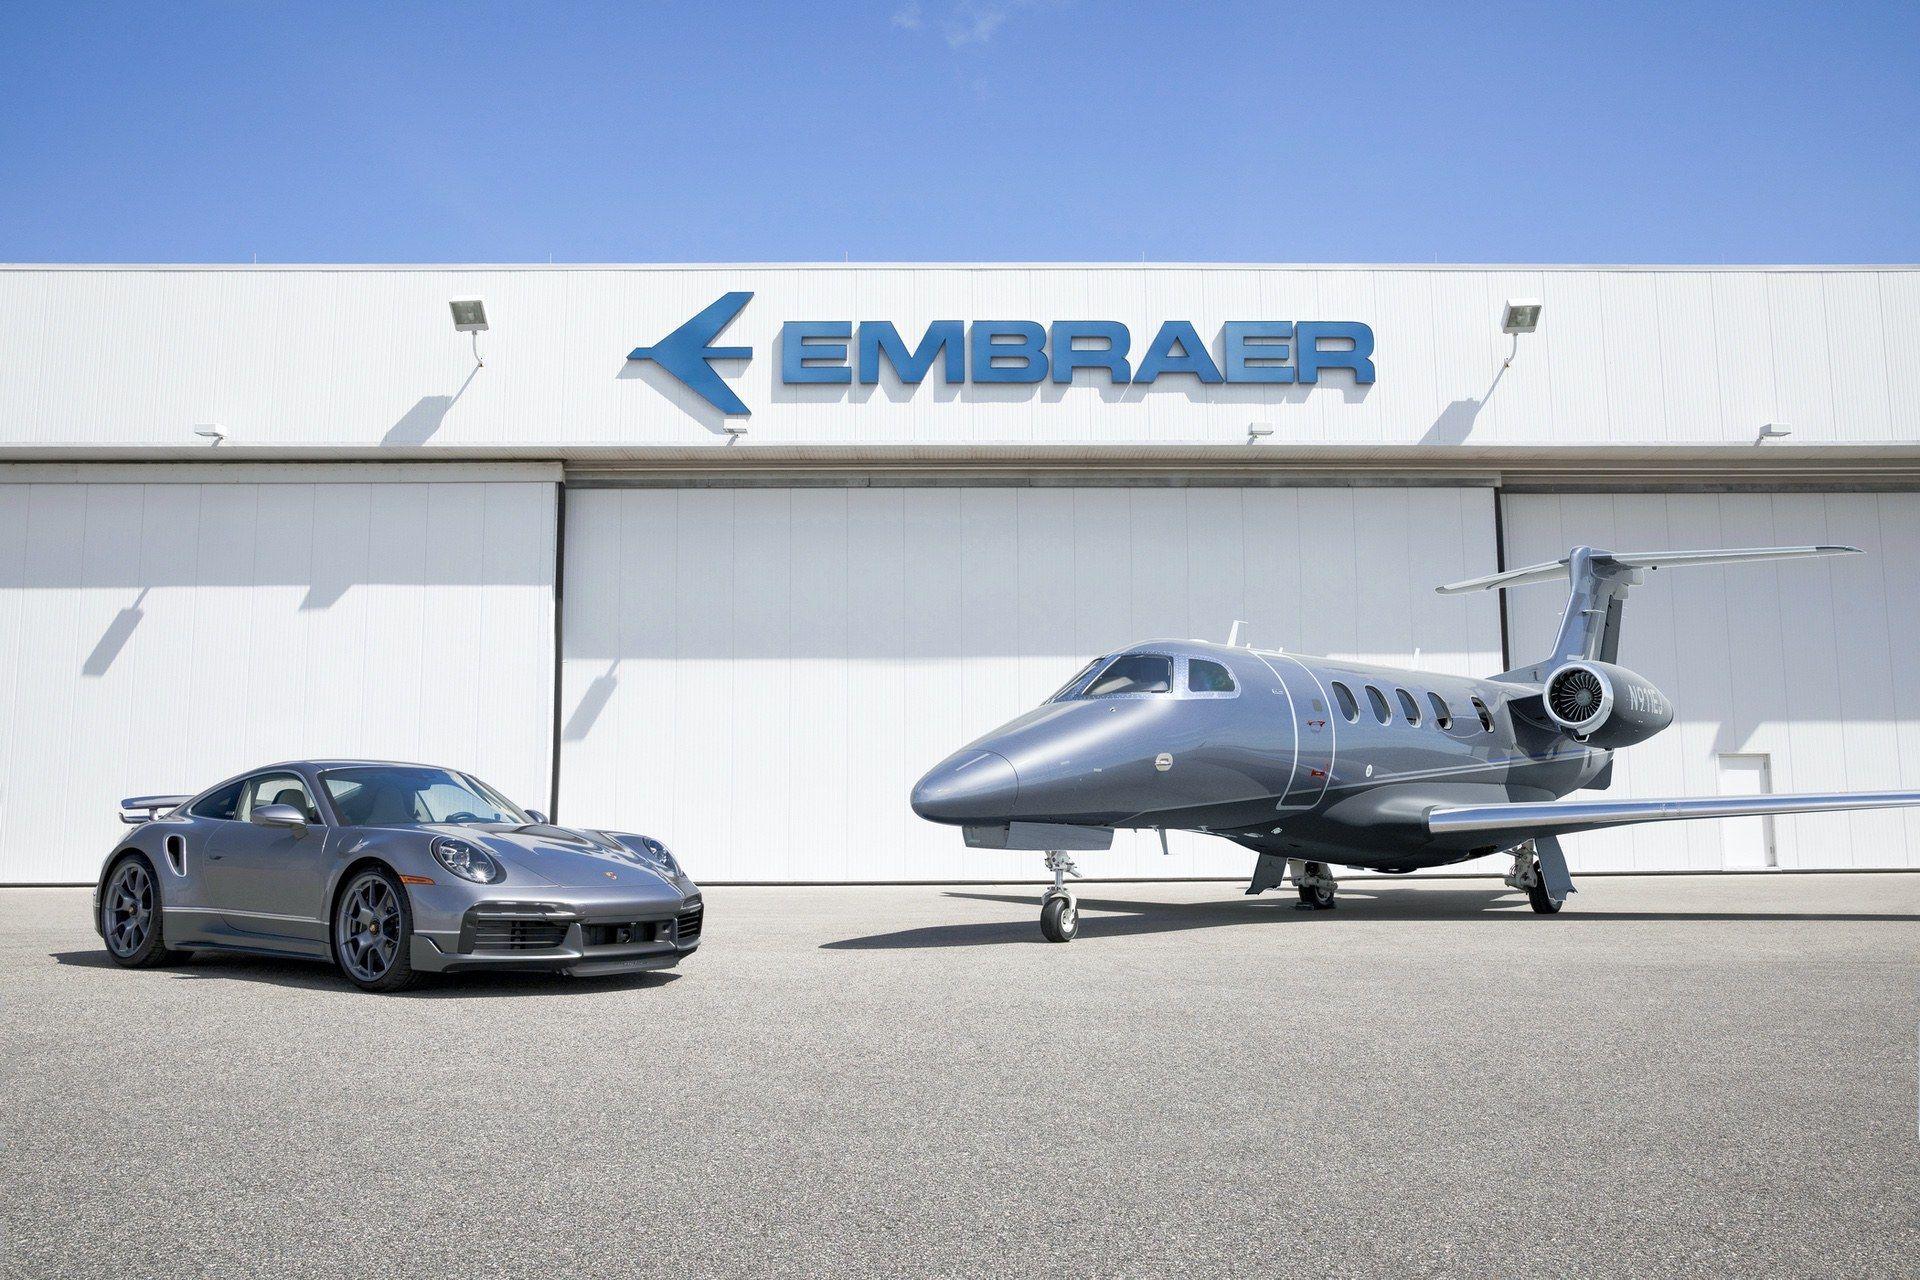 Embraer_Porsche_911_Turbo_S_0005